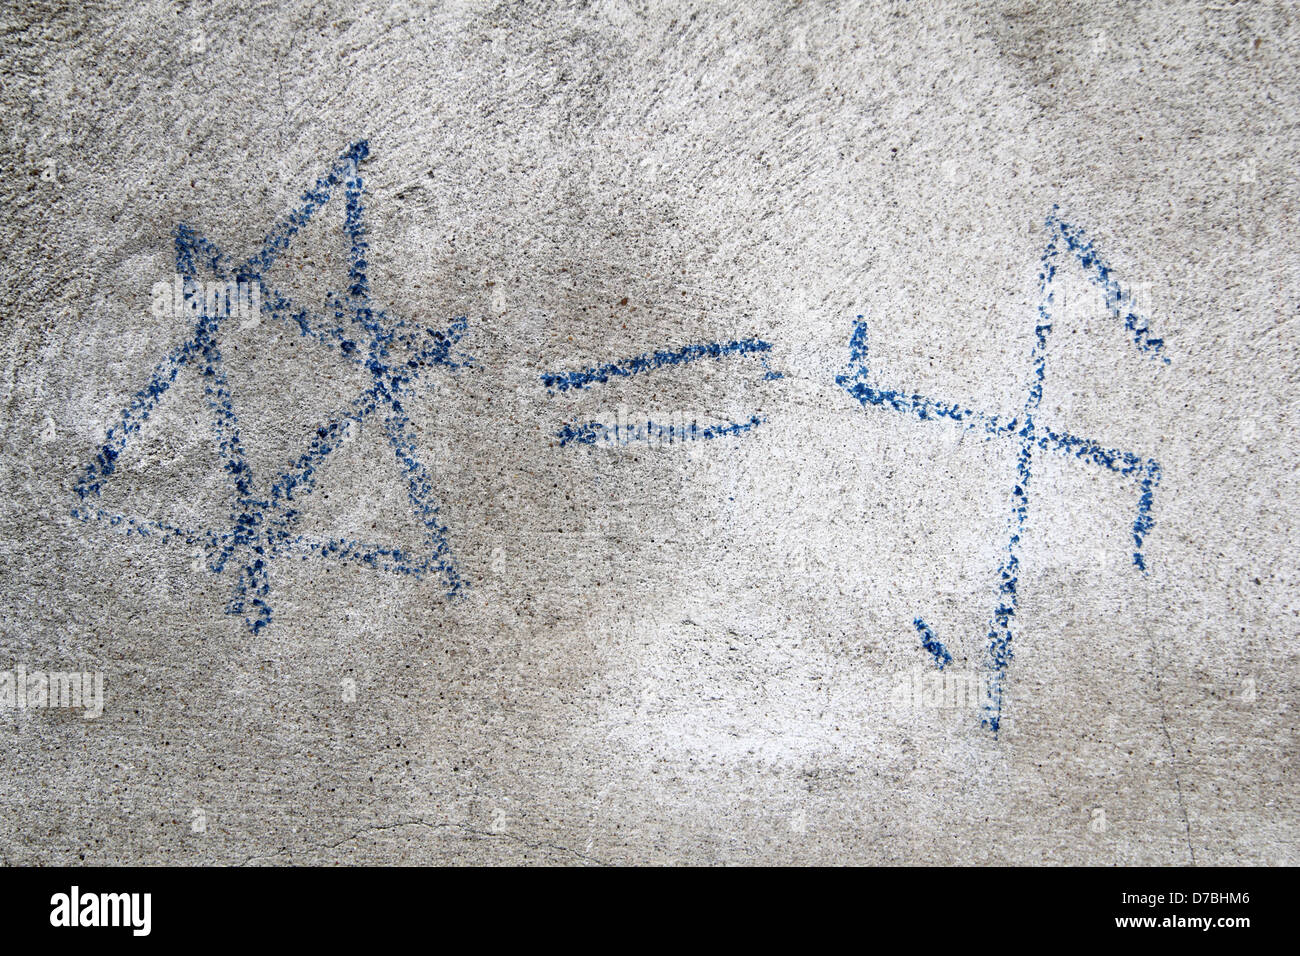 Anti-Semite graffiti in Krakow, Poland, equalizing a Nazi symbol with a Jewsih one - Stock Image